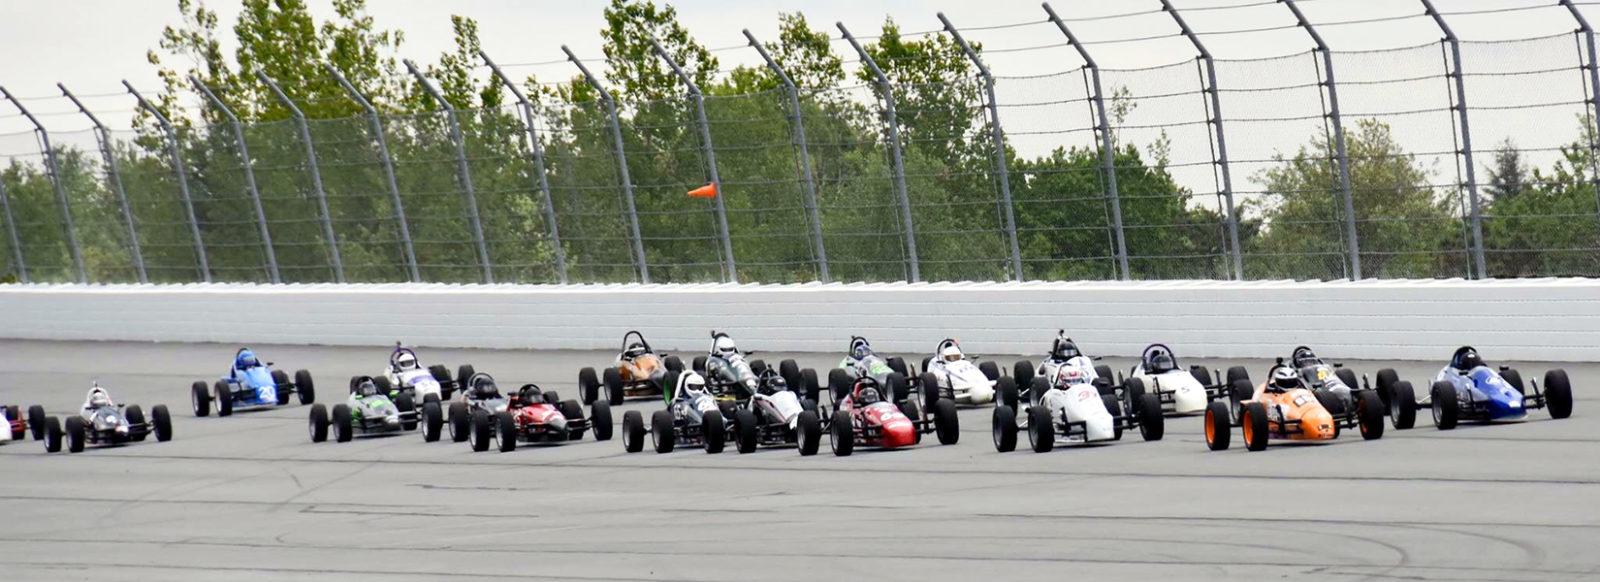 Pocono Raceway SCCA Race 2017